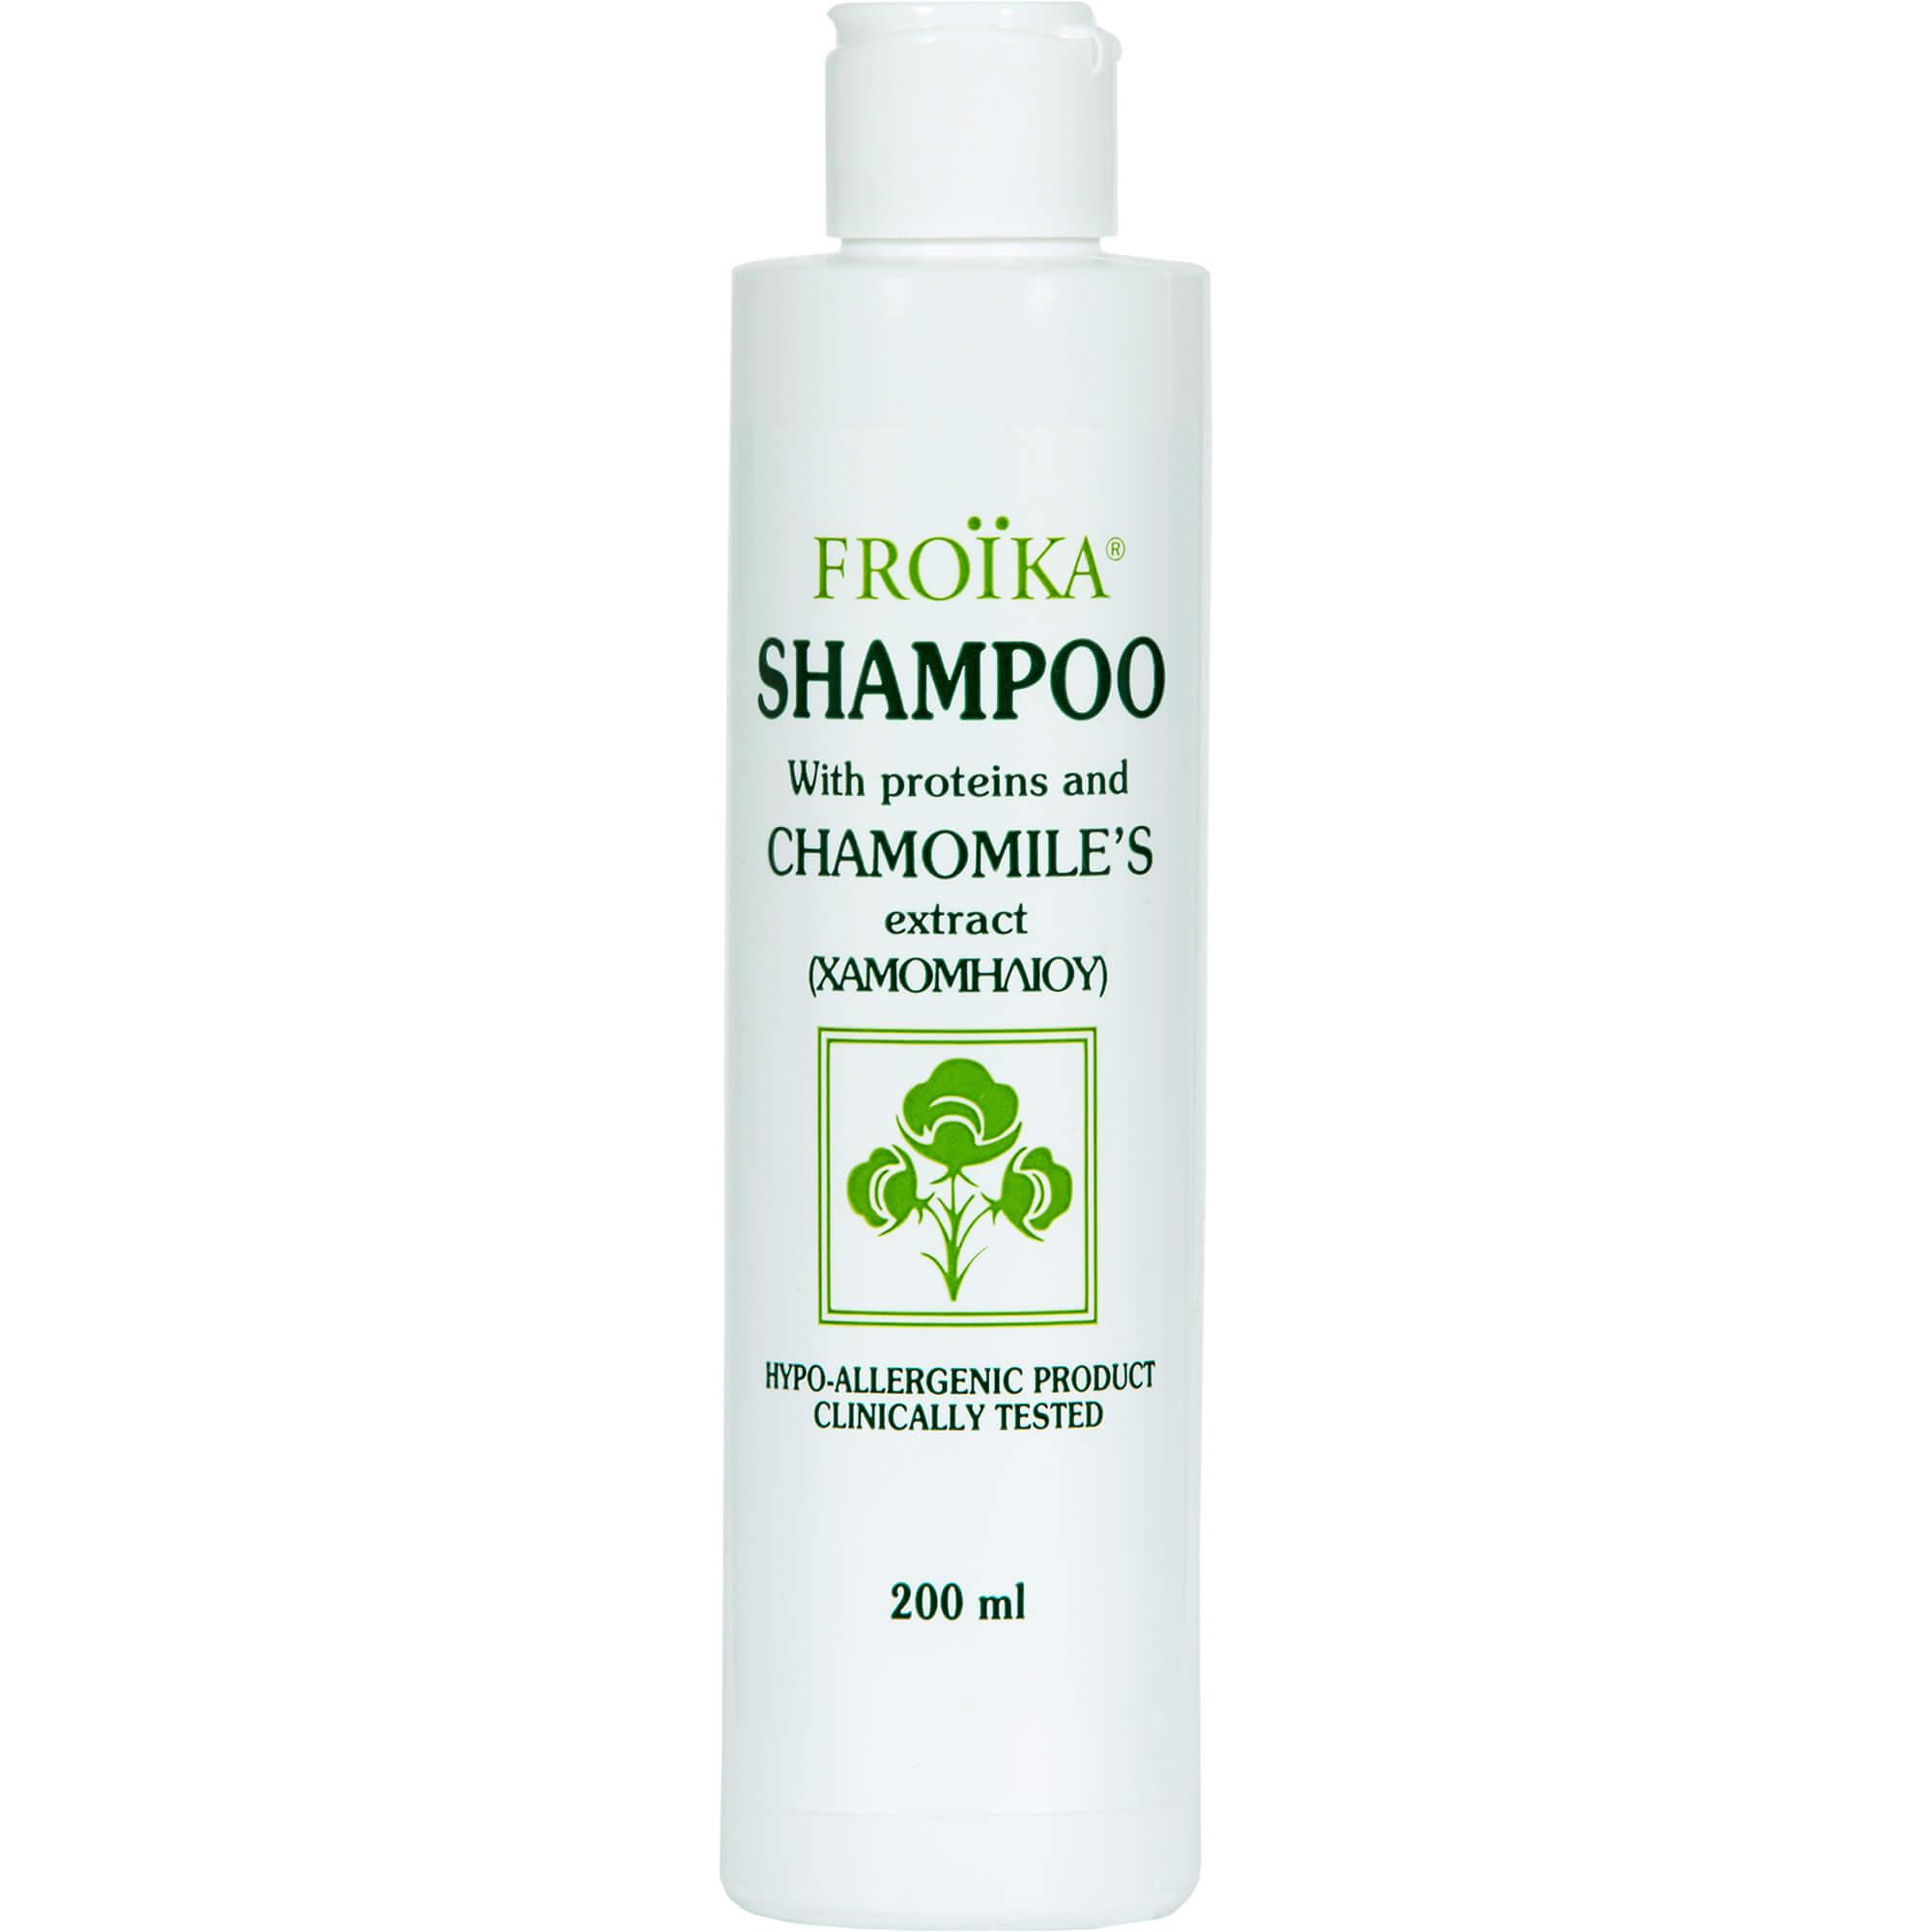 Froika Chamomiles Shampoo Σαμπουάν με Πρωτεΐνες και Εκχύλισμα Χαμομηλιού για Όλους Τους Τύπους Μαλλιών 200ml